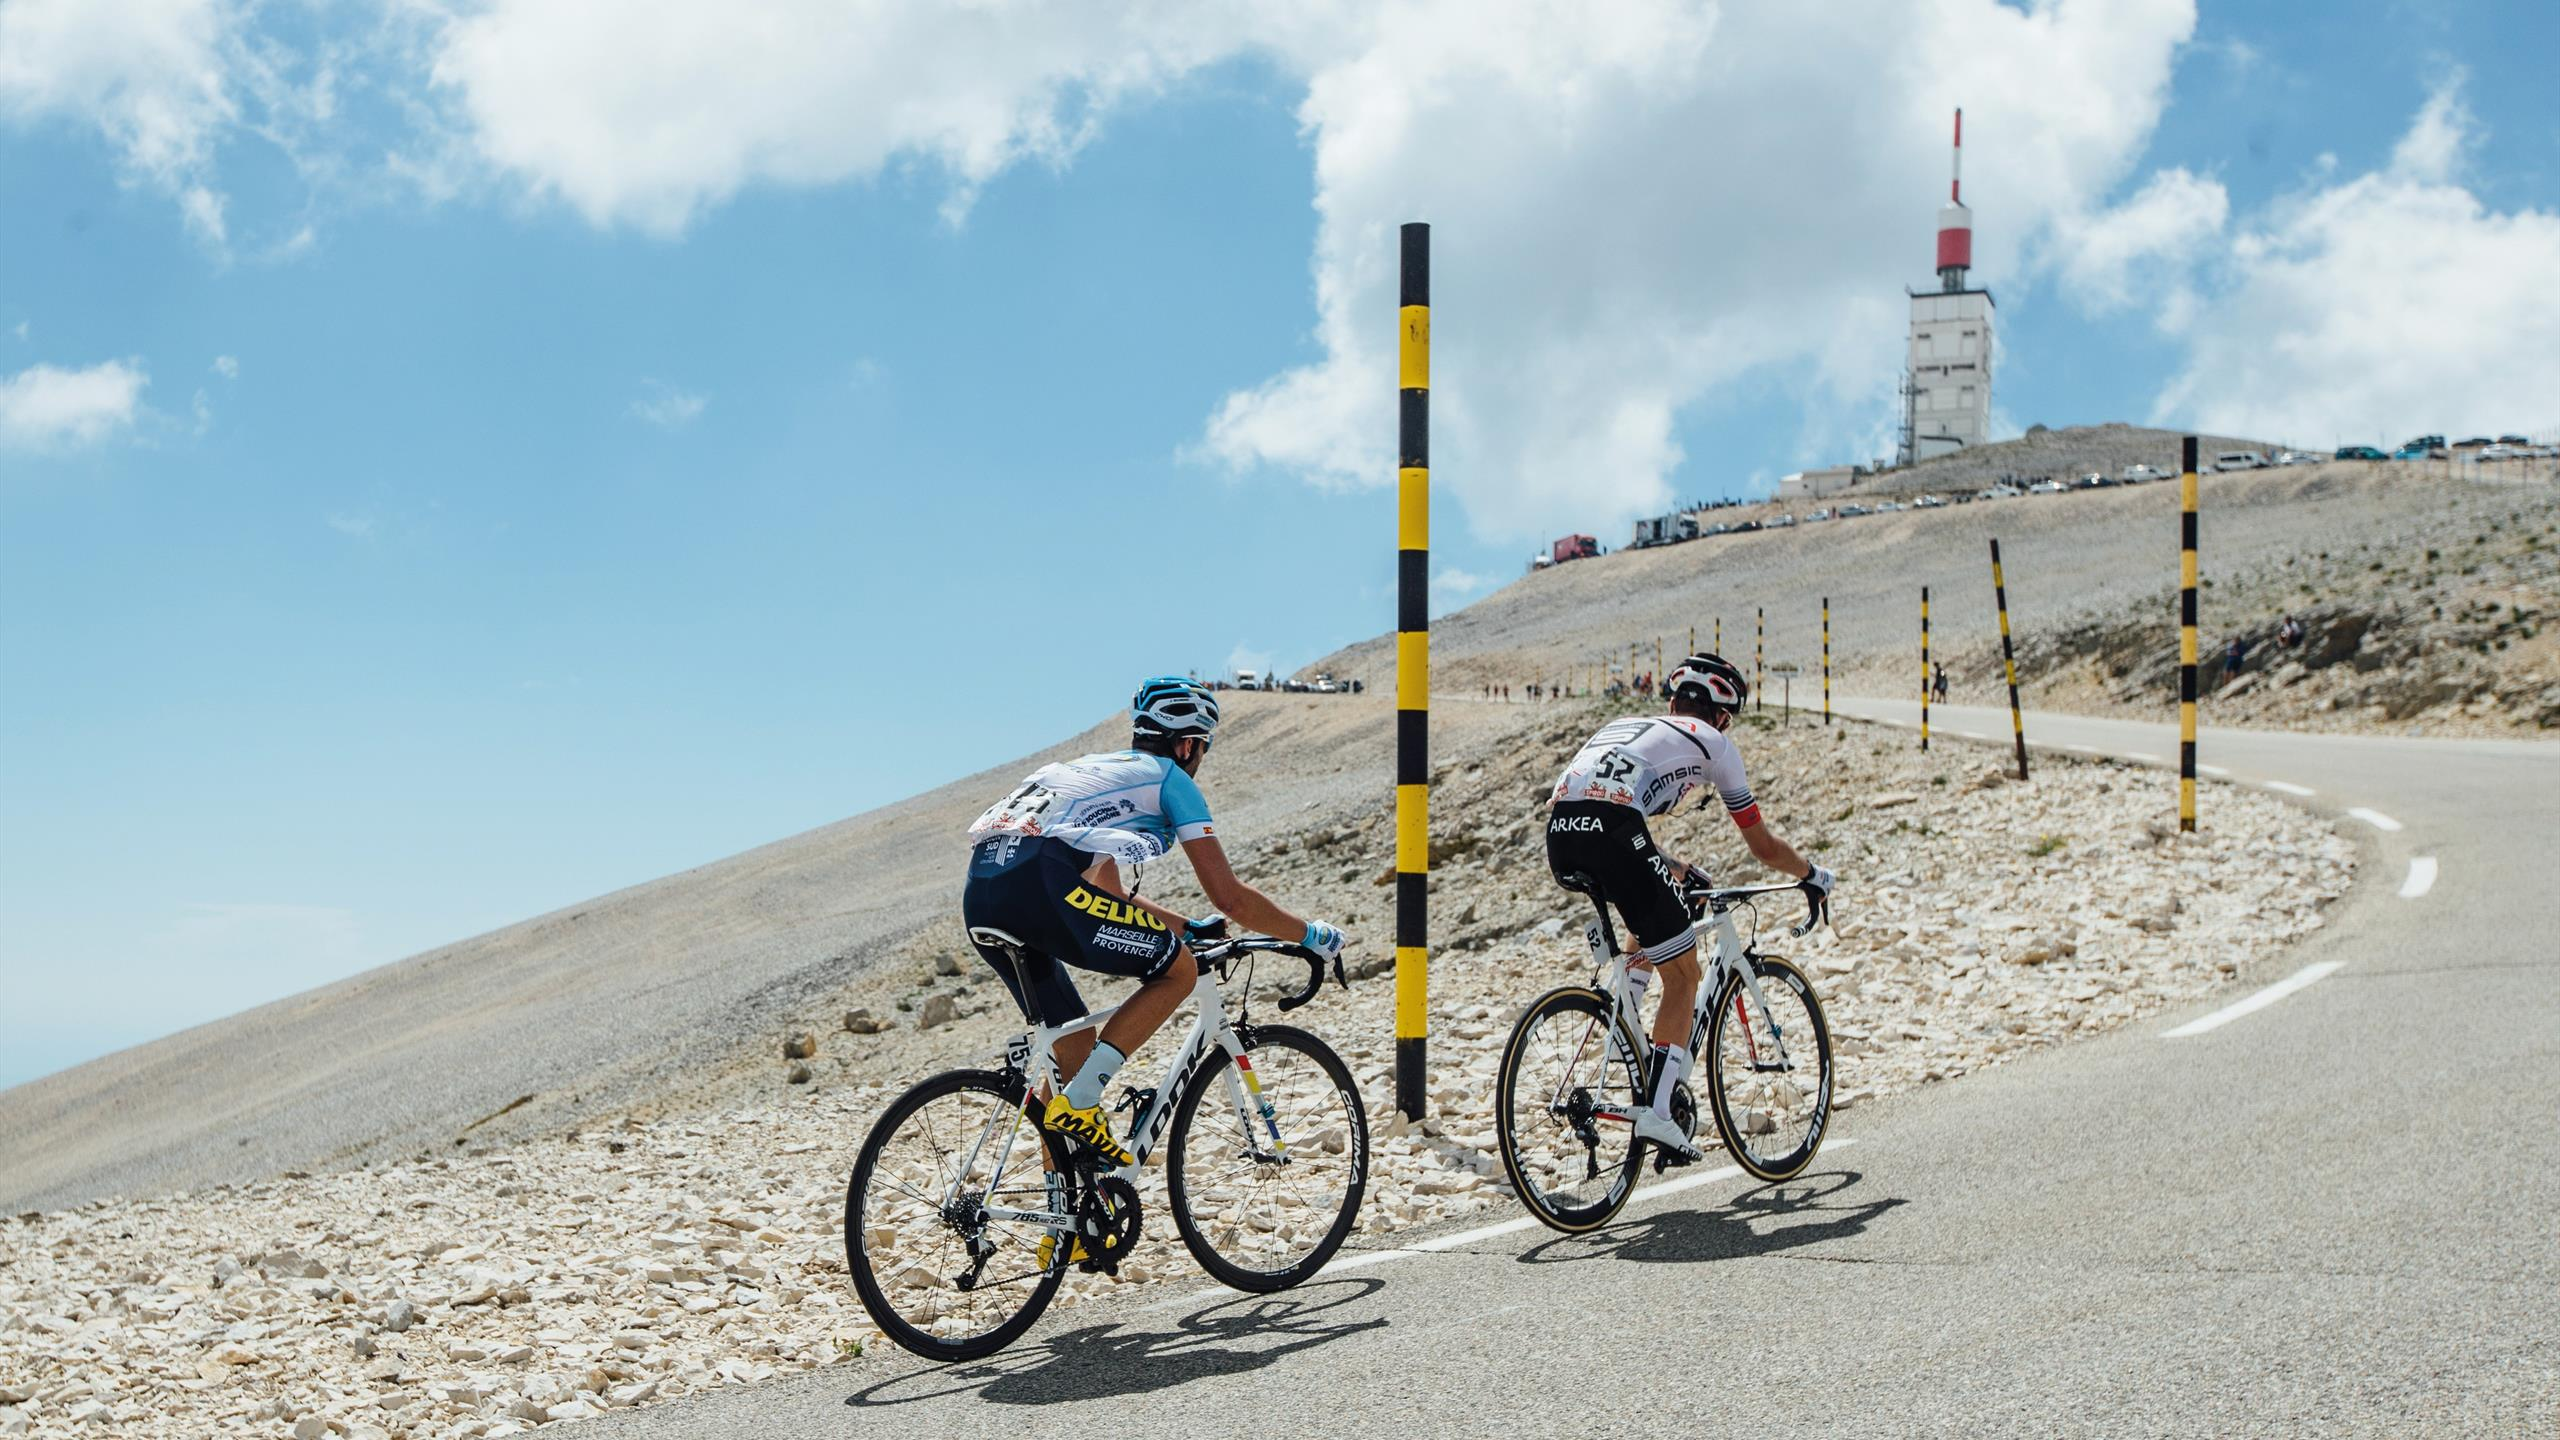 Tour de france 2021 stage 14 betting county championship 2021 bettingadvice